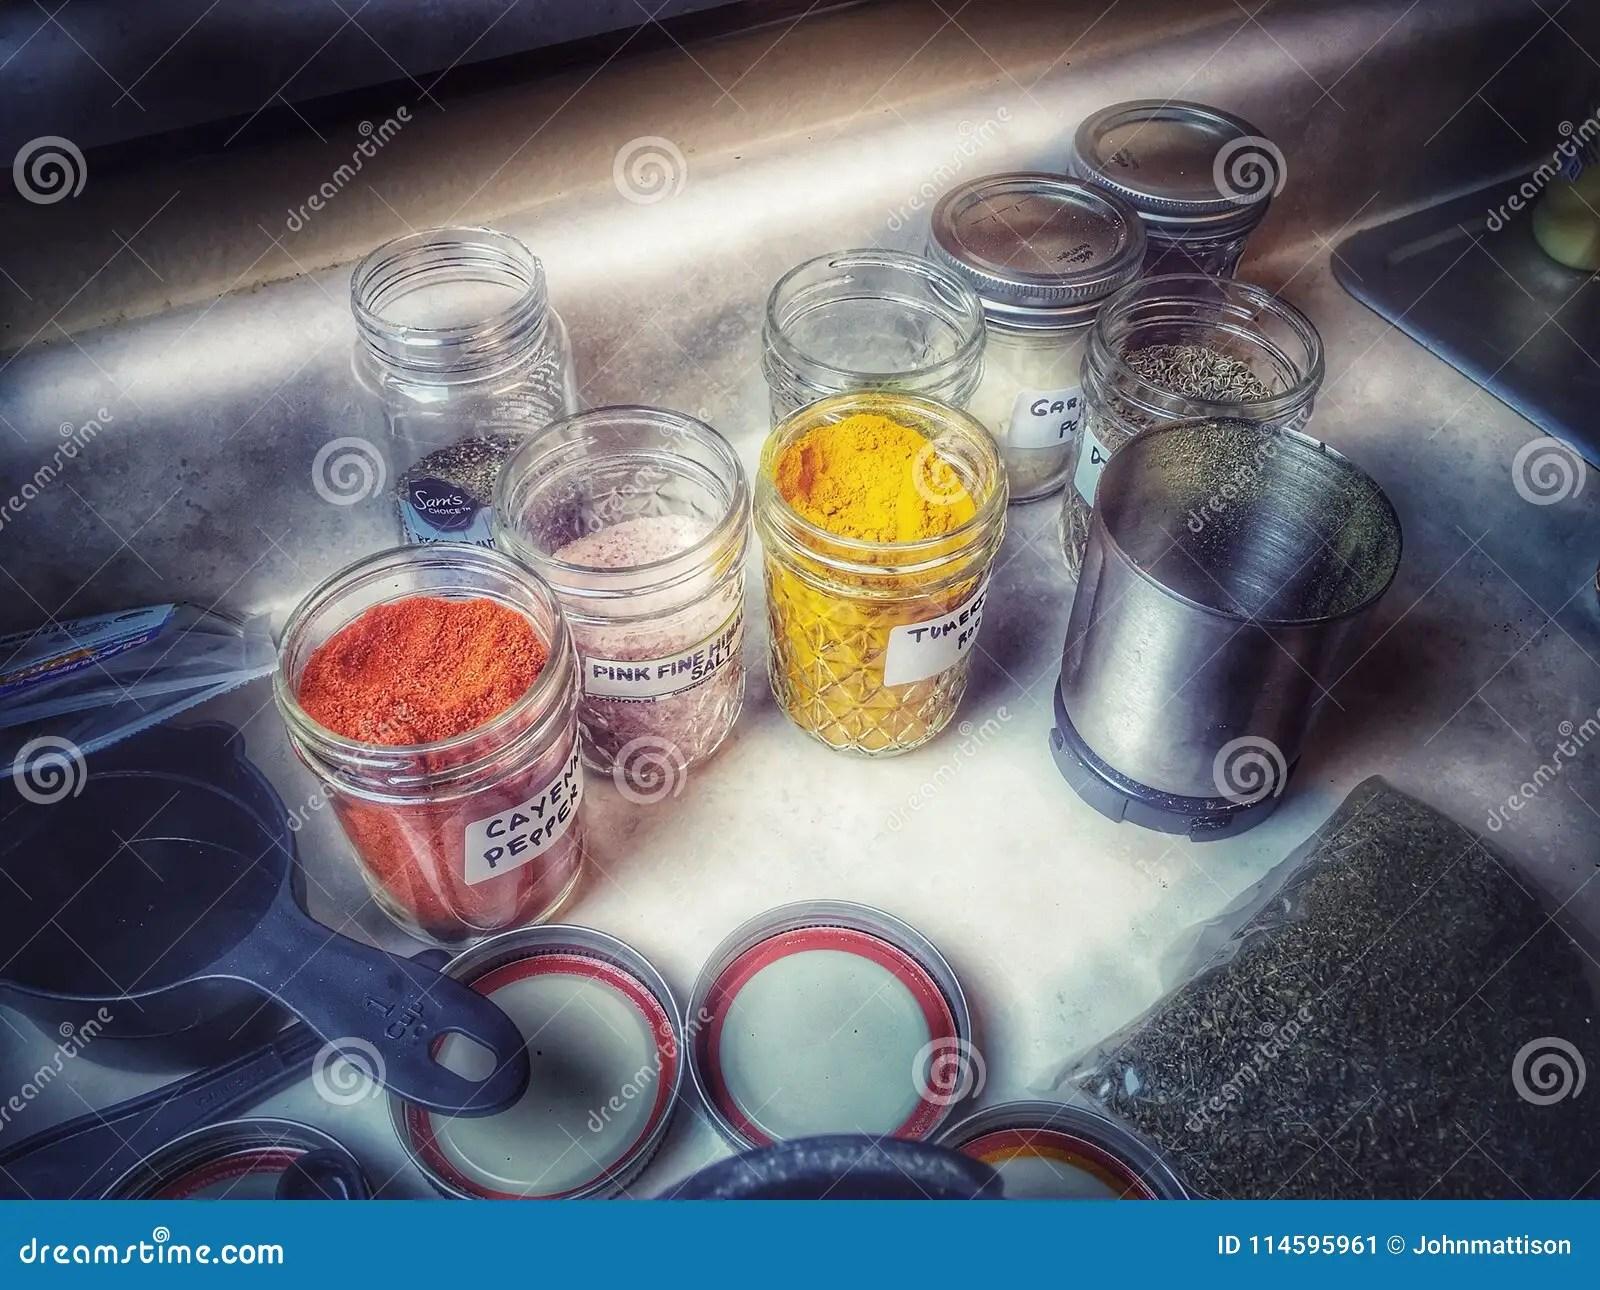 kitchen cabinet covers backsplashes in kitchens 晒干在金属螺盖玻璃瓶的厨柜库存图片 图片包括有恐怖 万圣节 瓶子 自 回家做的香料混合接近在自创调味料混合的一个金属螺盖玻璃瓶